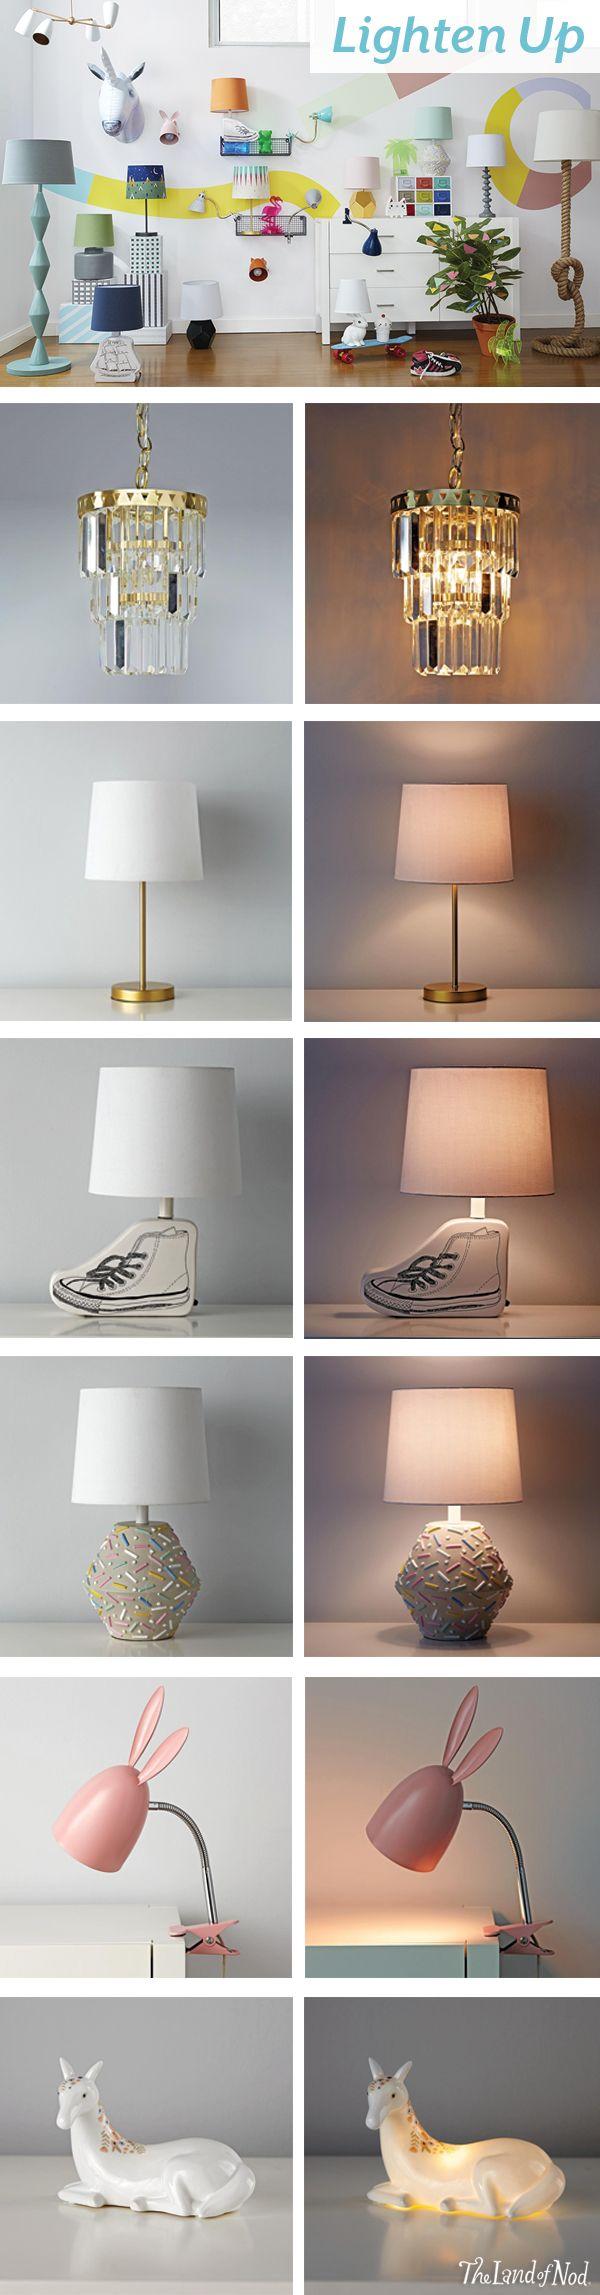 Best 25+ Modern kids ceiling lighting ideas on Pinterest | Lights ...